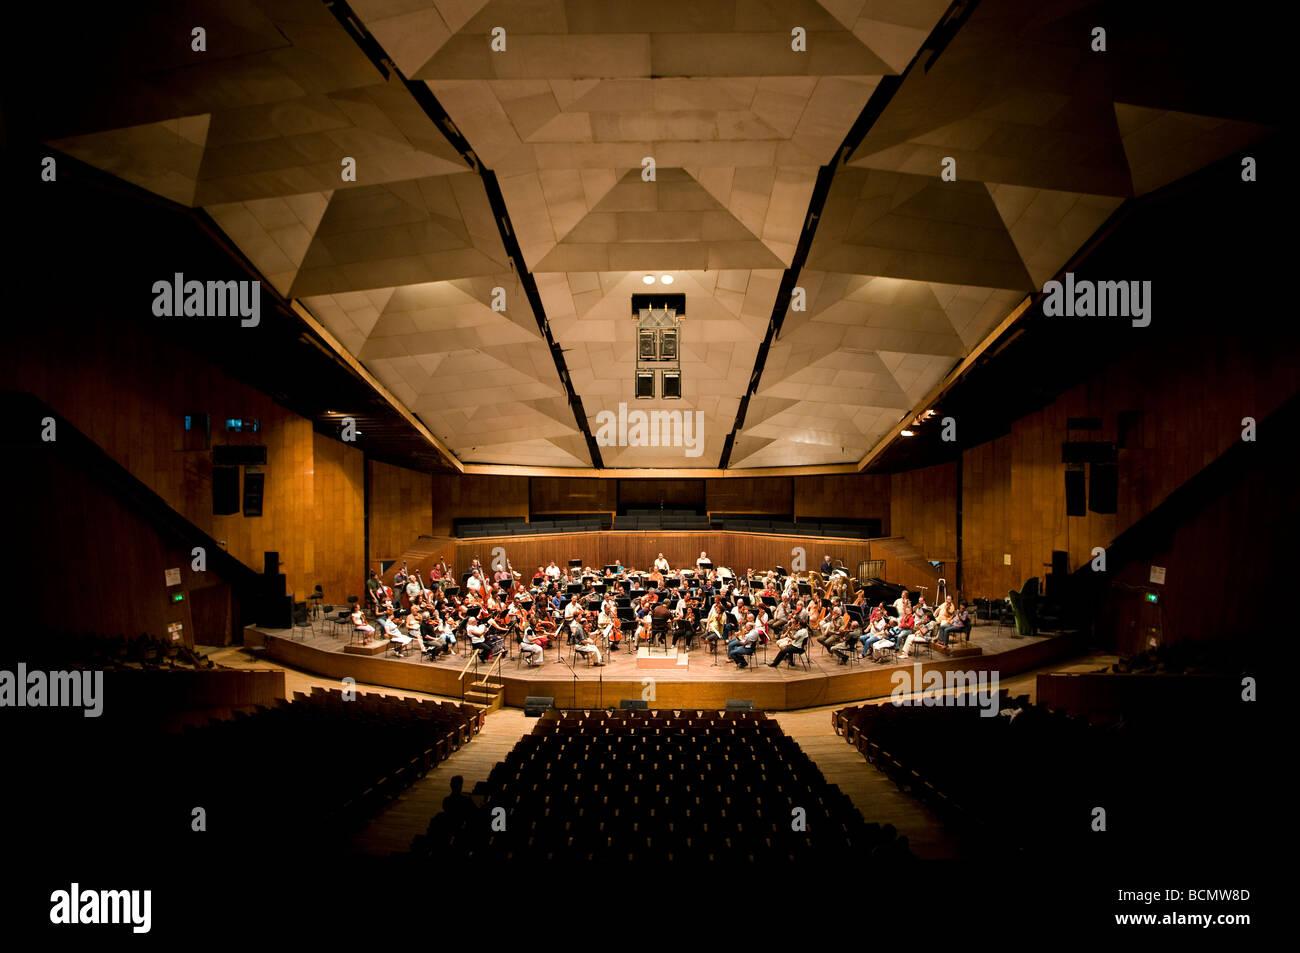 Rehearsal of the Israeli Philharmonic Orchestra in Auditorium Mann Central Tel Aviv Israel - Stock Image